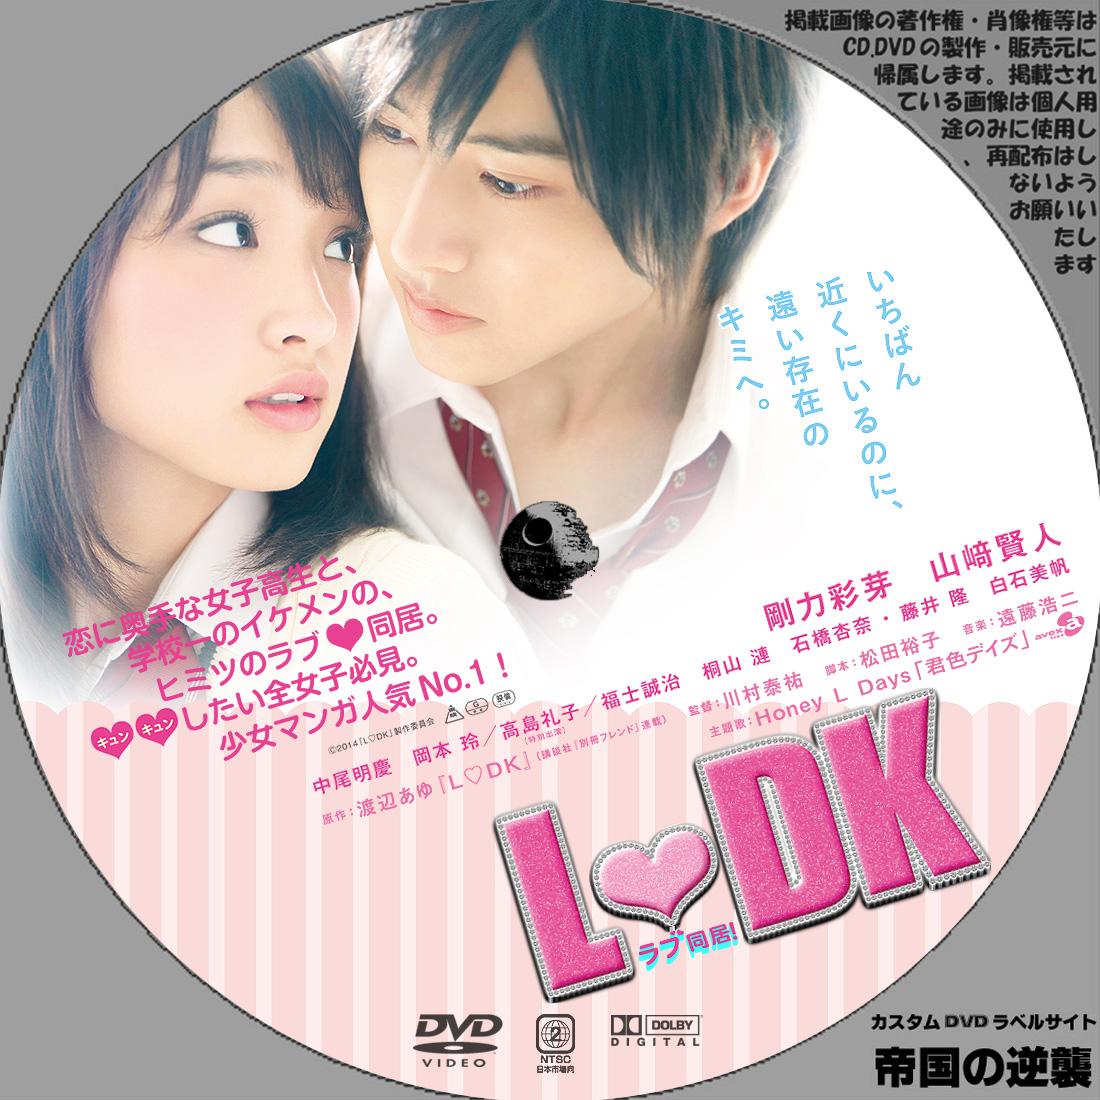 L・DK ラブ同居 DVDラベル: 新作映畫のDVDラベル 続・帝國の逆襲